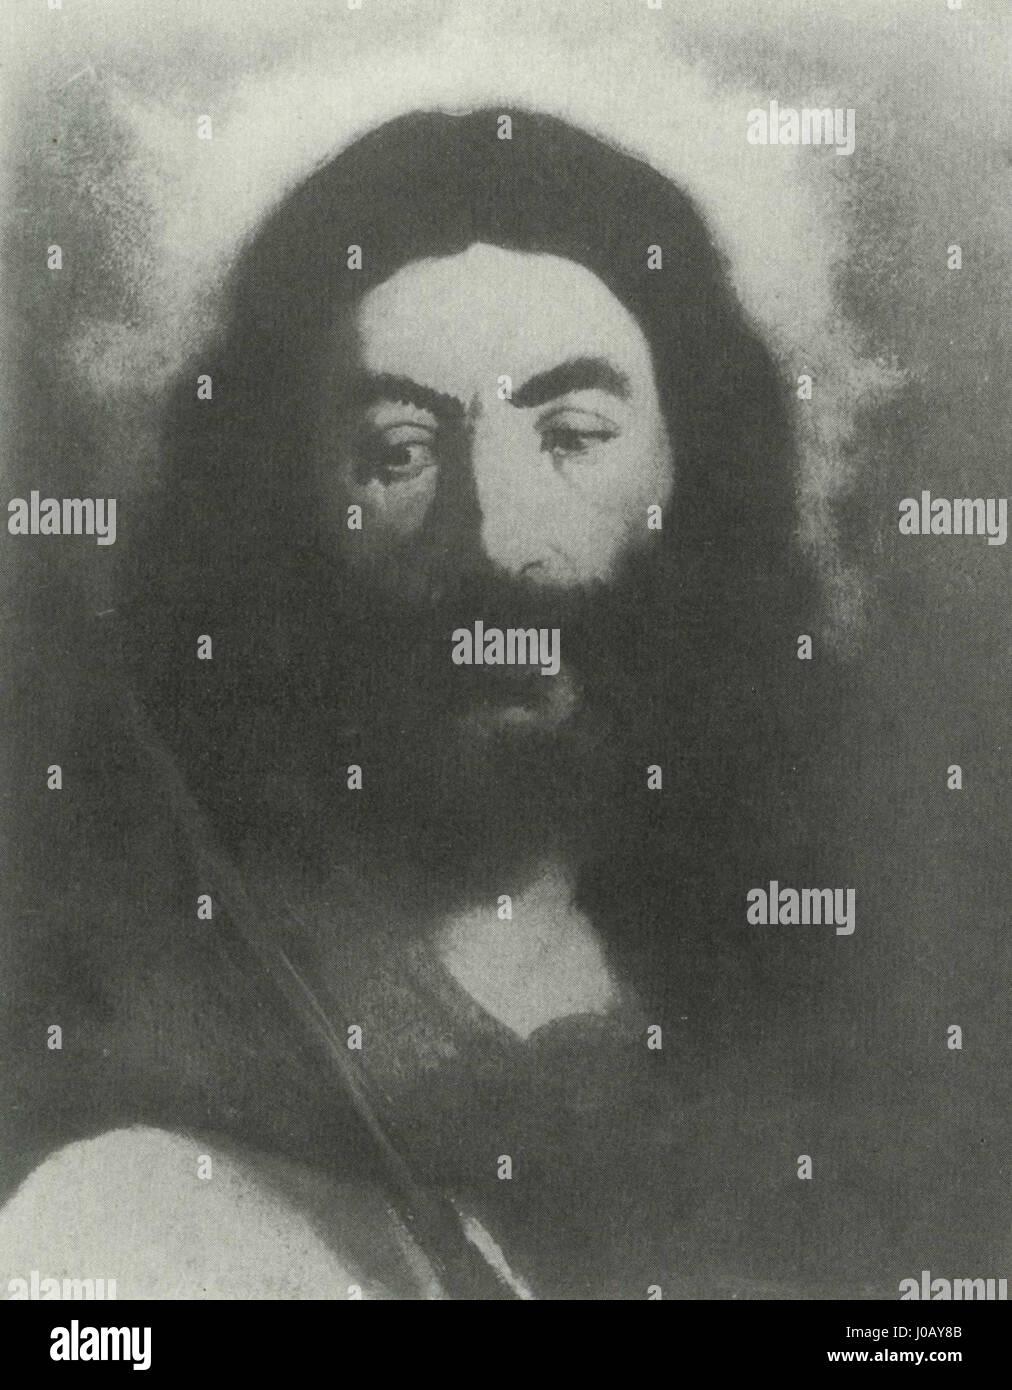 Édouard Manet - Christ au rosseau (RW 13) - Stock Image